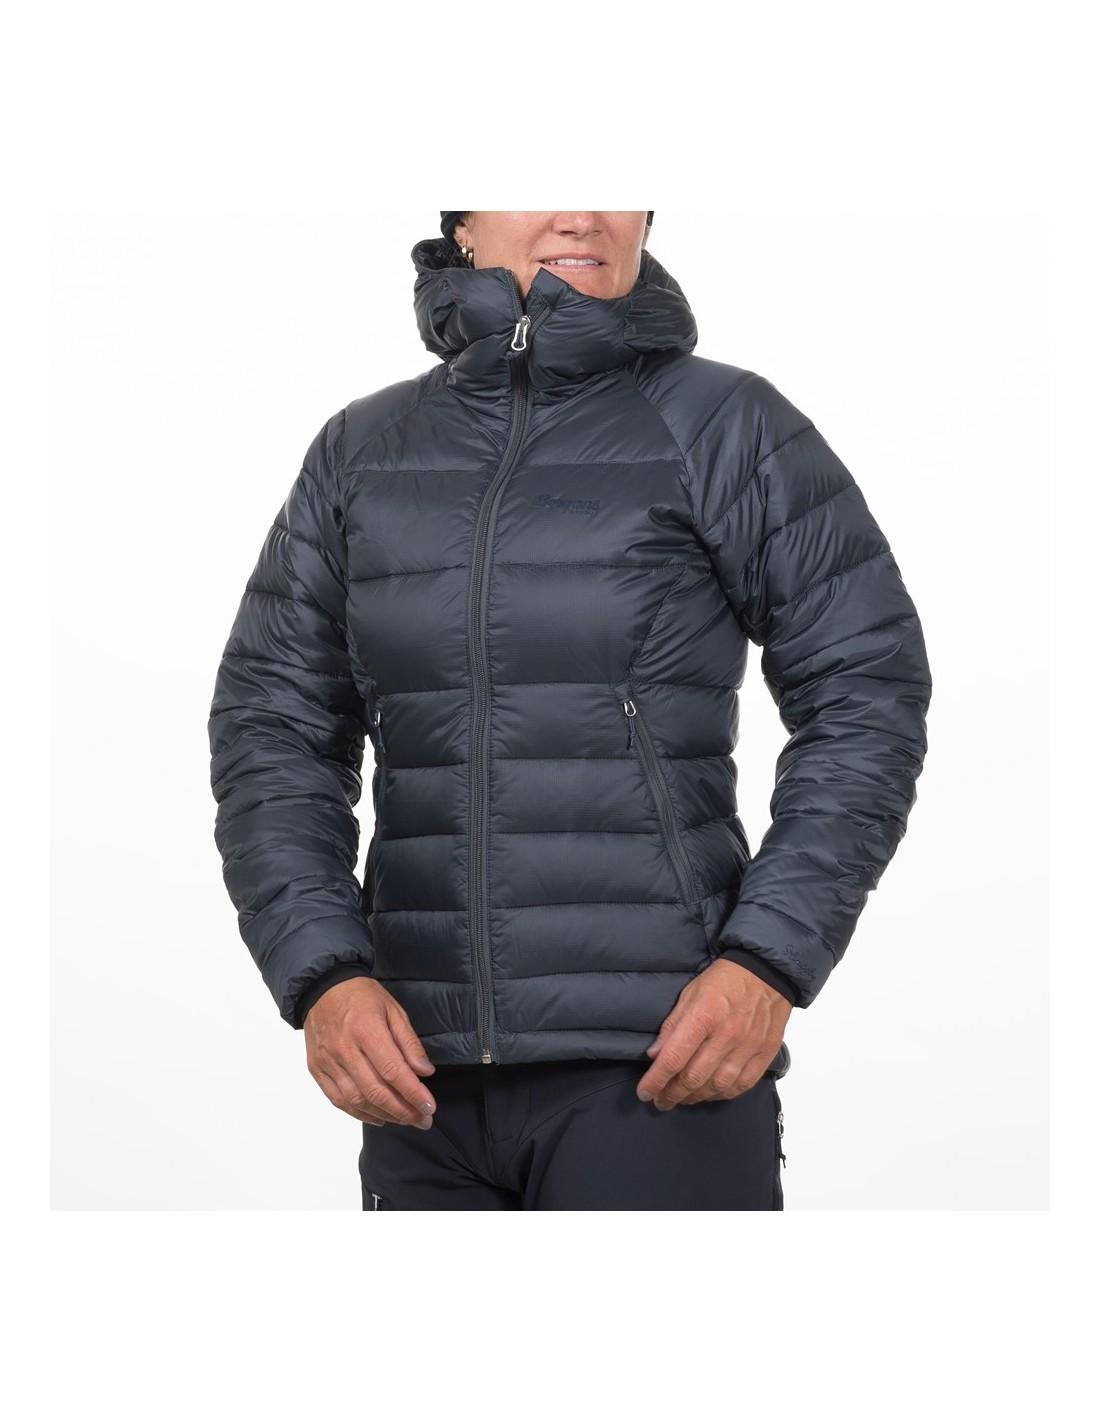 827ab8ec Ski og Snowboardjakker Damer Bergans Slingsby Down Light Dame Jacket w/Hood  8723 ...